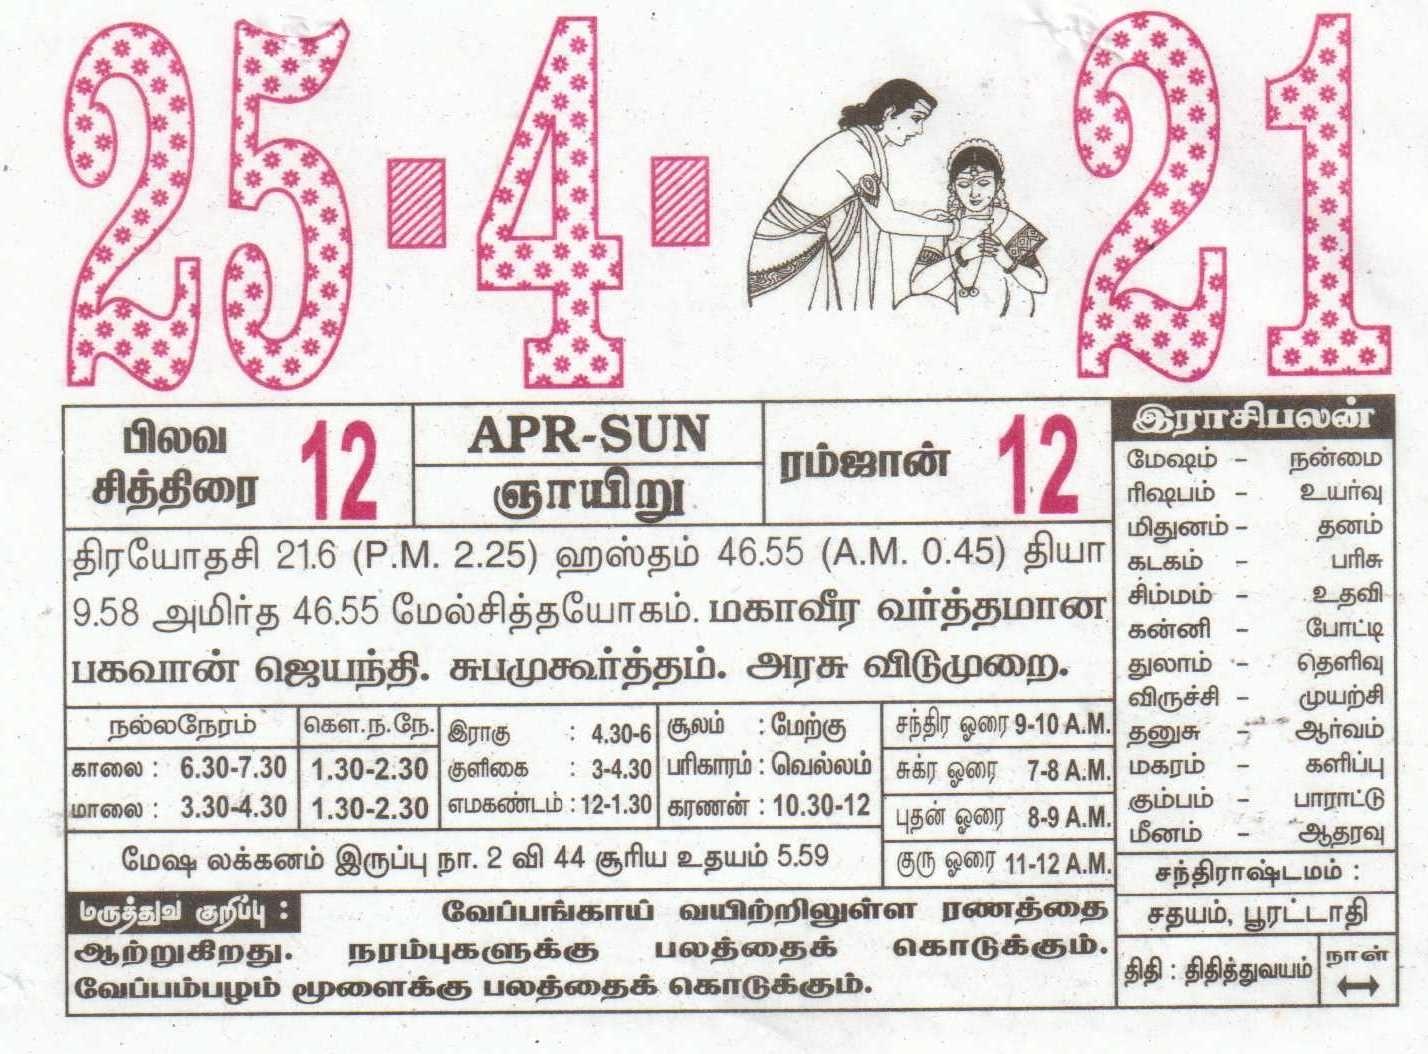 25-04-2021 Daily Calendar | Date 25 , January Daily Tear Off Calendar | Daily Panchangam Rasi Palan November 2021 Calendar Tamil